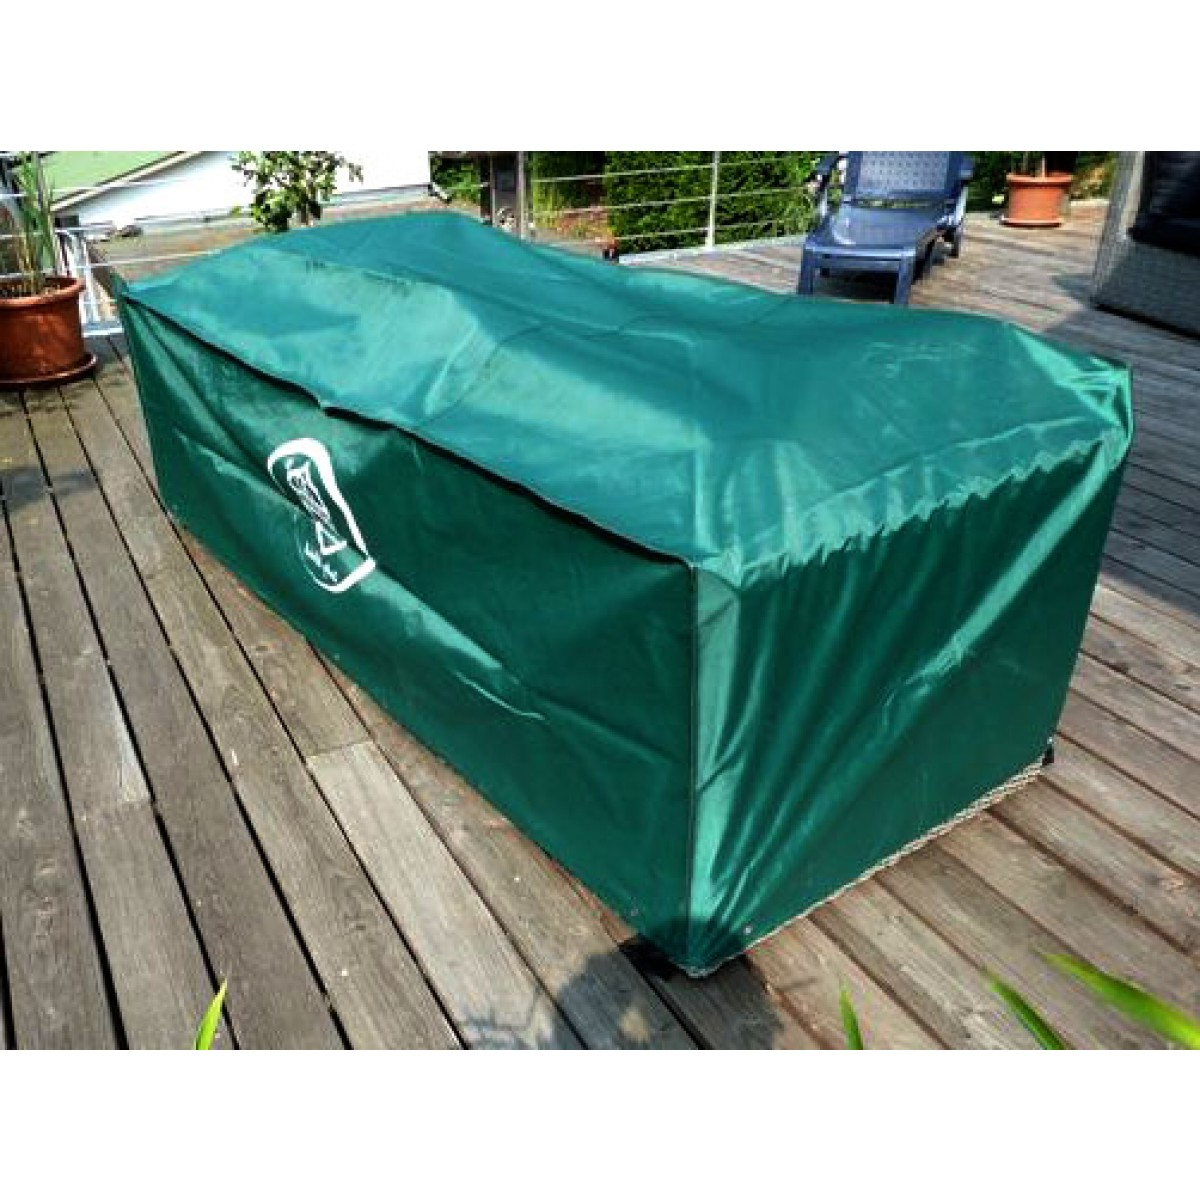 Fundas Impermeables Para Muebles De Jardin Etdg Funda Protectora Para sofà De Jardà N